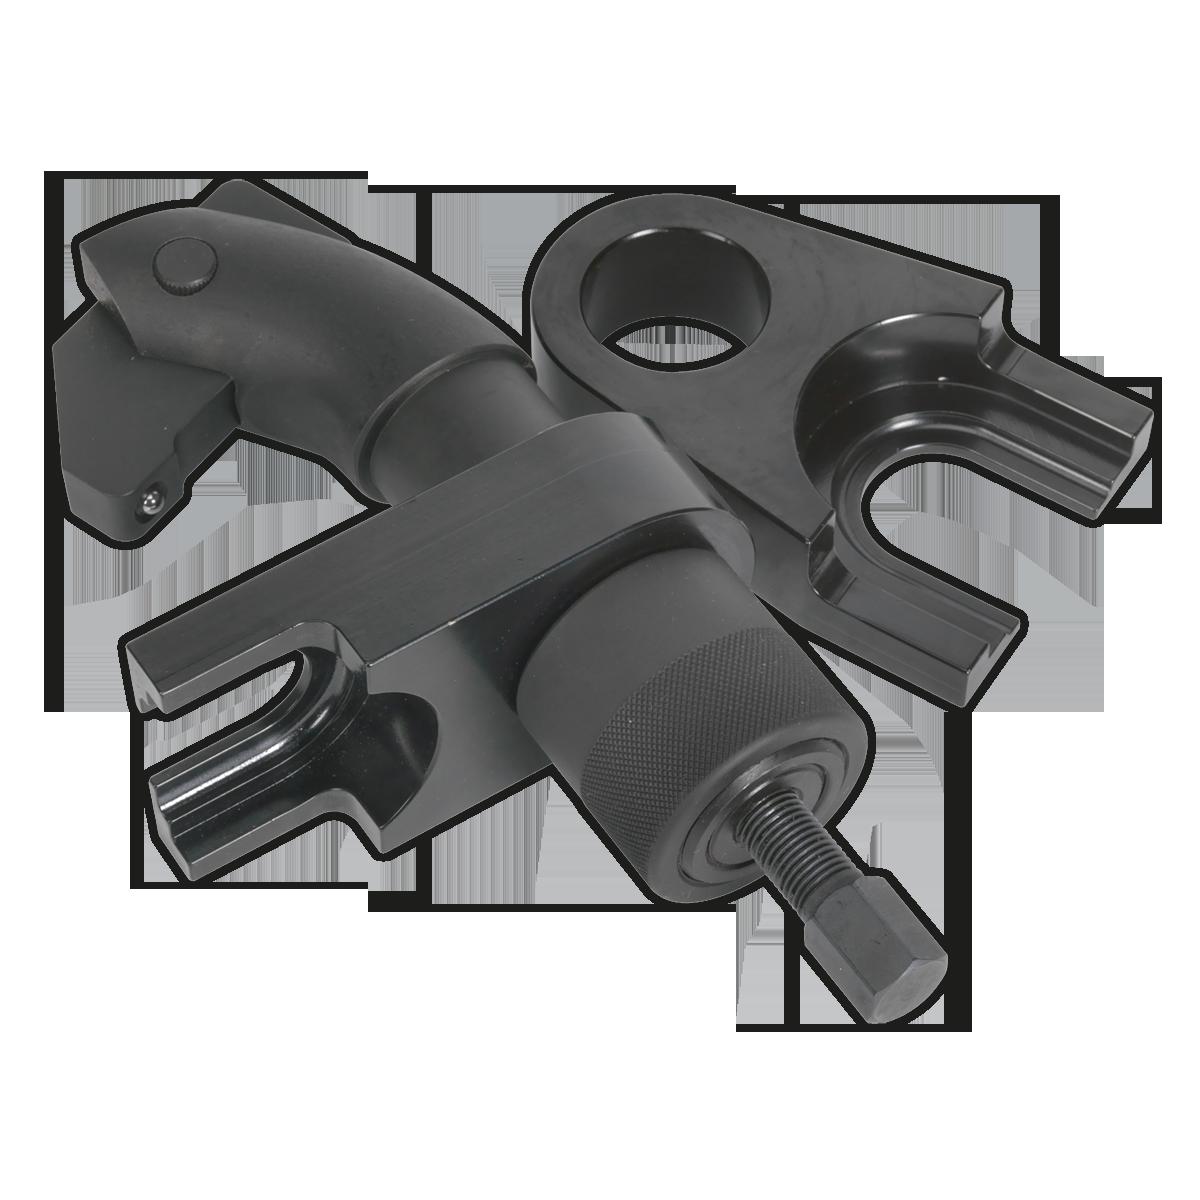 Ball Joint Splitter - Commercial 17mm Hex Drive